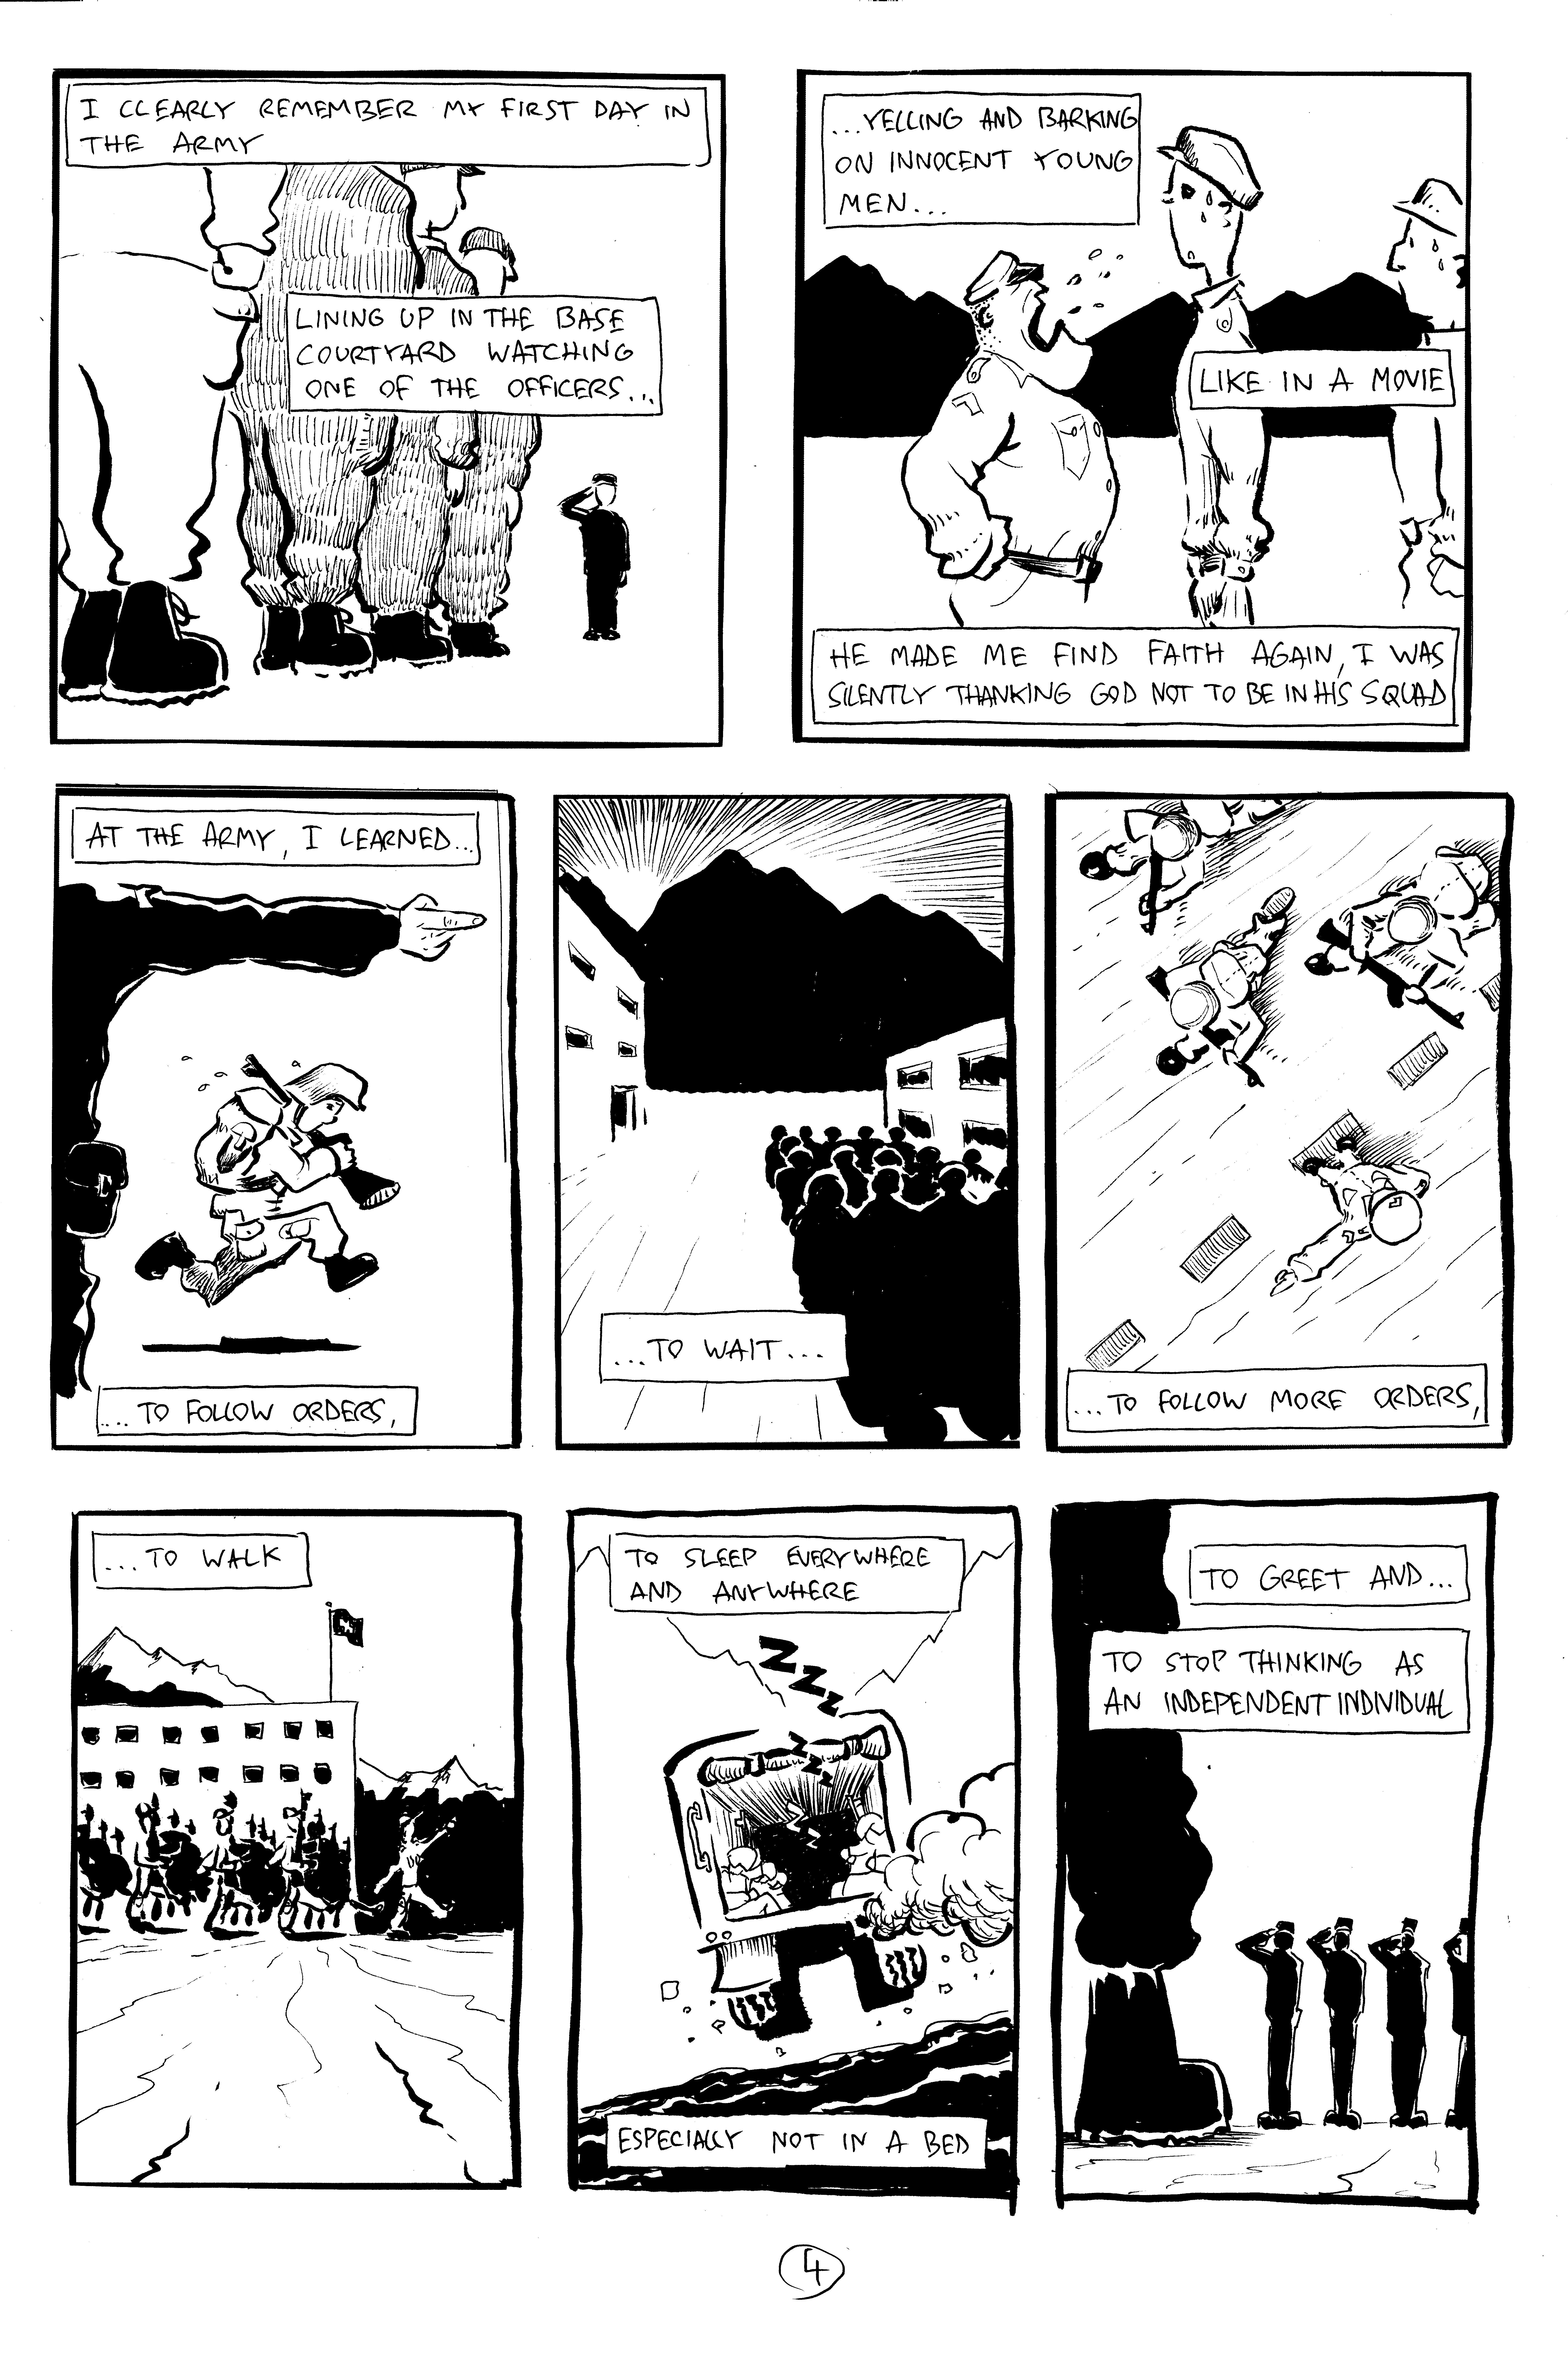 Swiss Army Life - Page 4